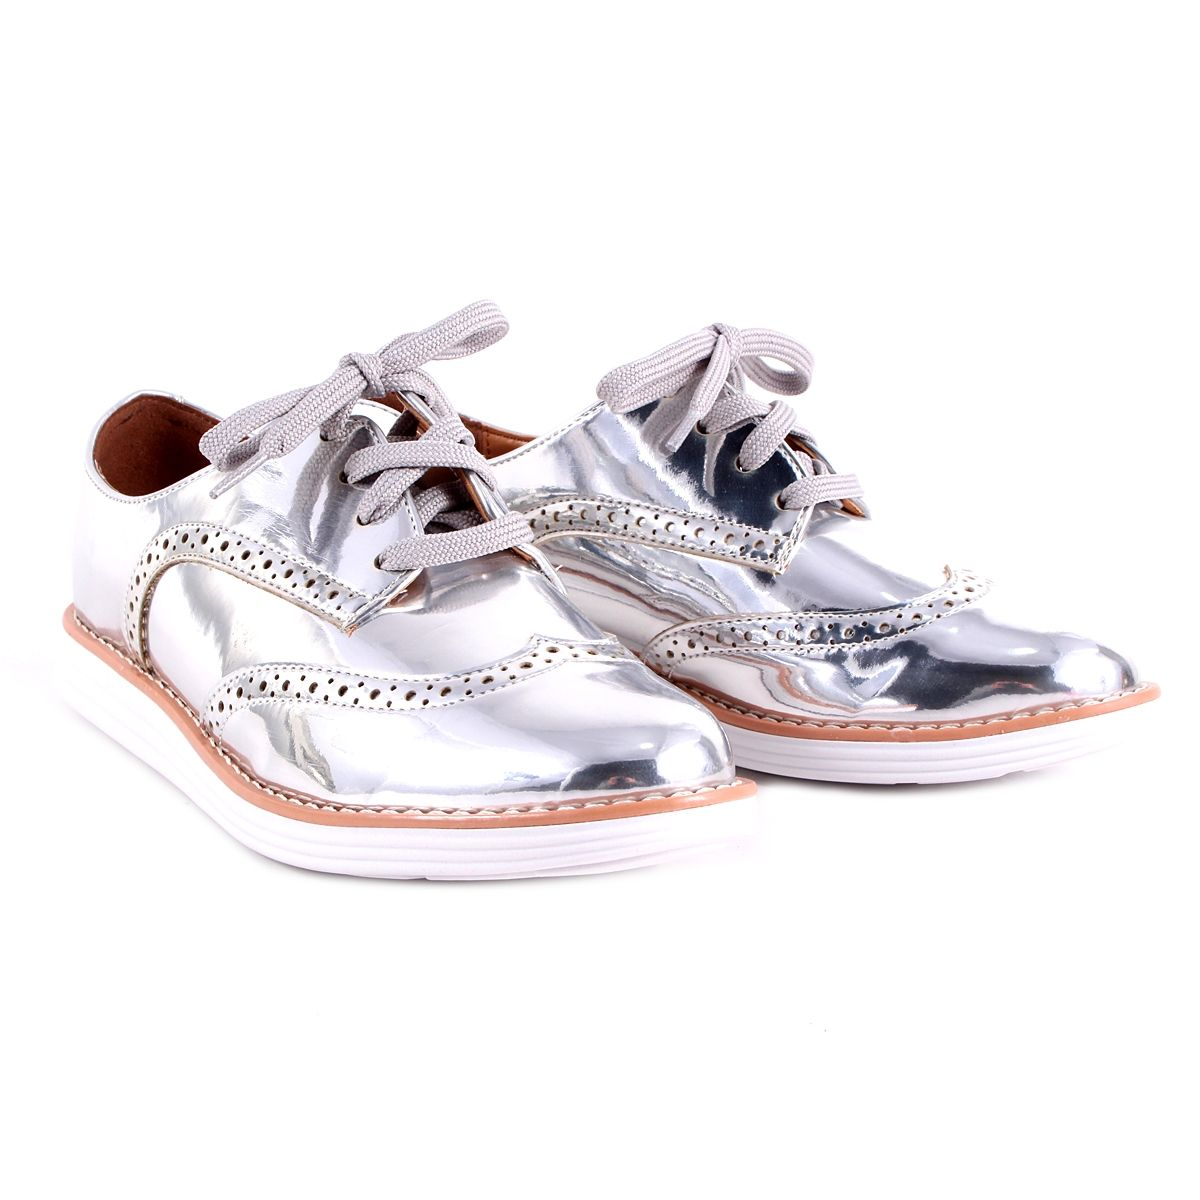 44c2638c7 Sapato Oxford Vizzano Prata Metalizado Oxford Vizzano, Marcas De Calçados  Femininos, Sapatos Metalizados,